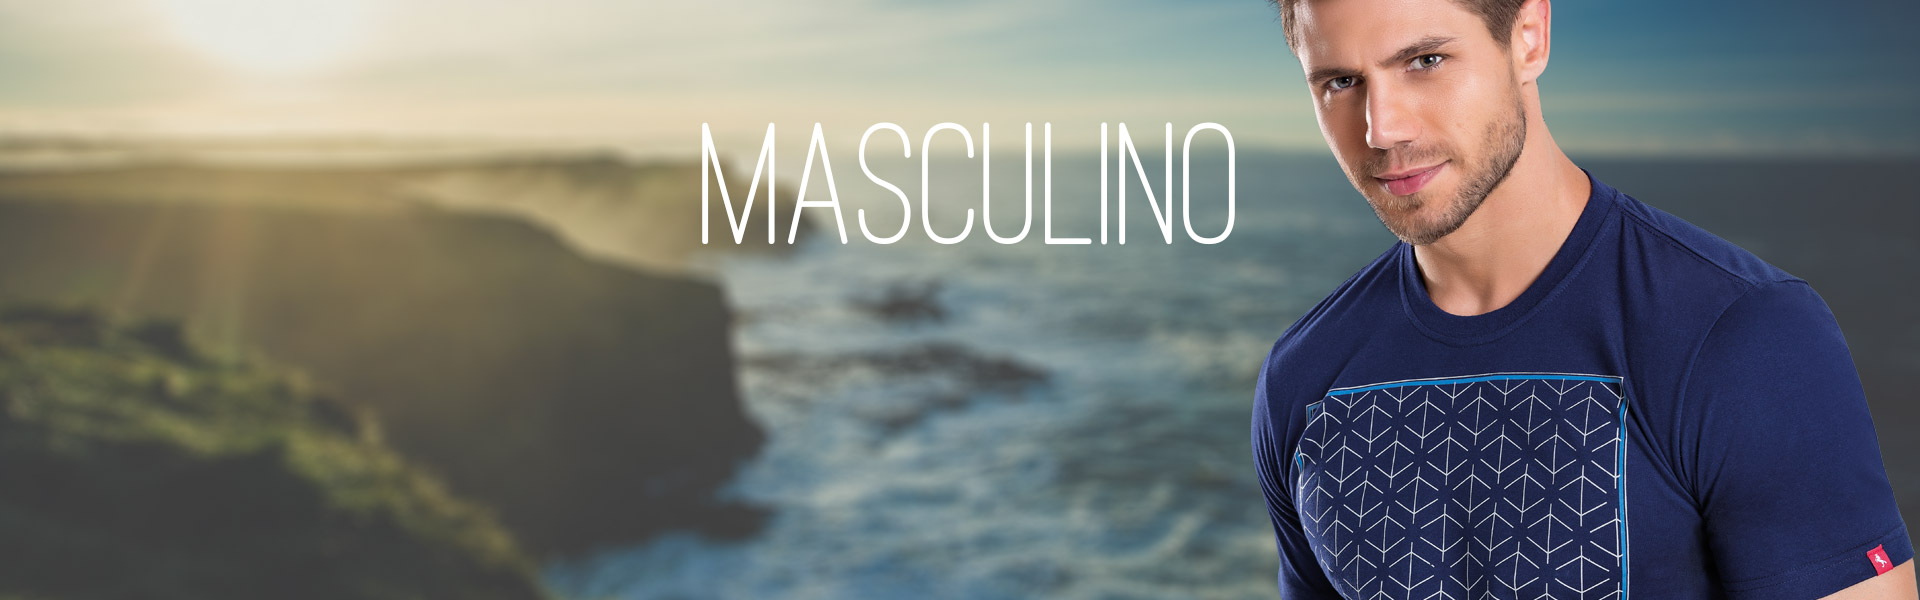 BANNER-MASCULINO